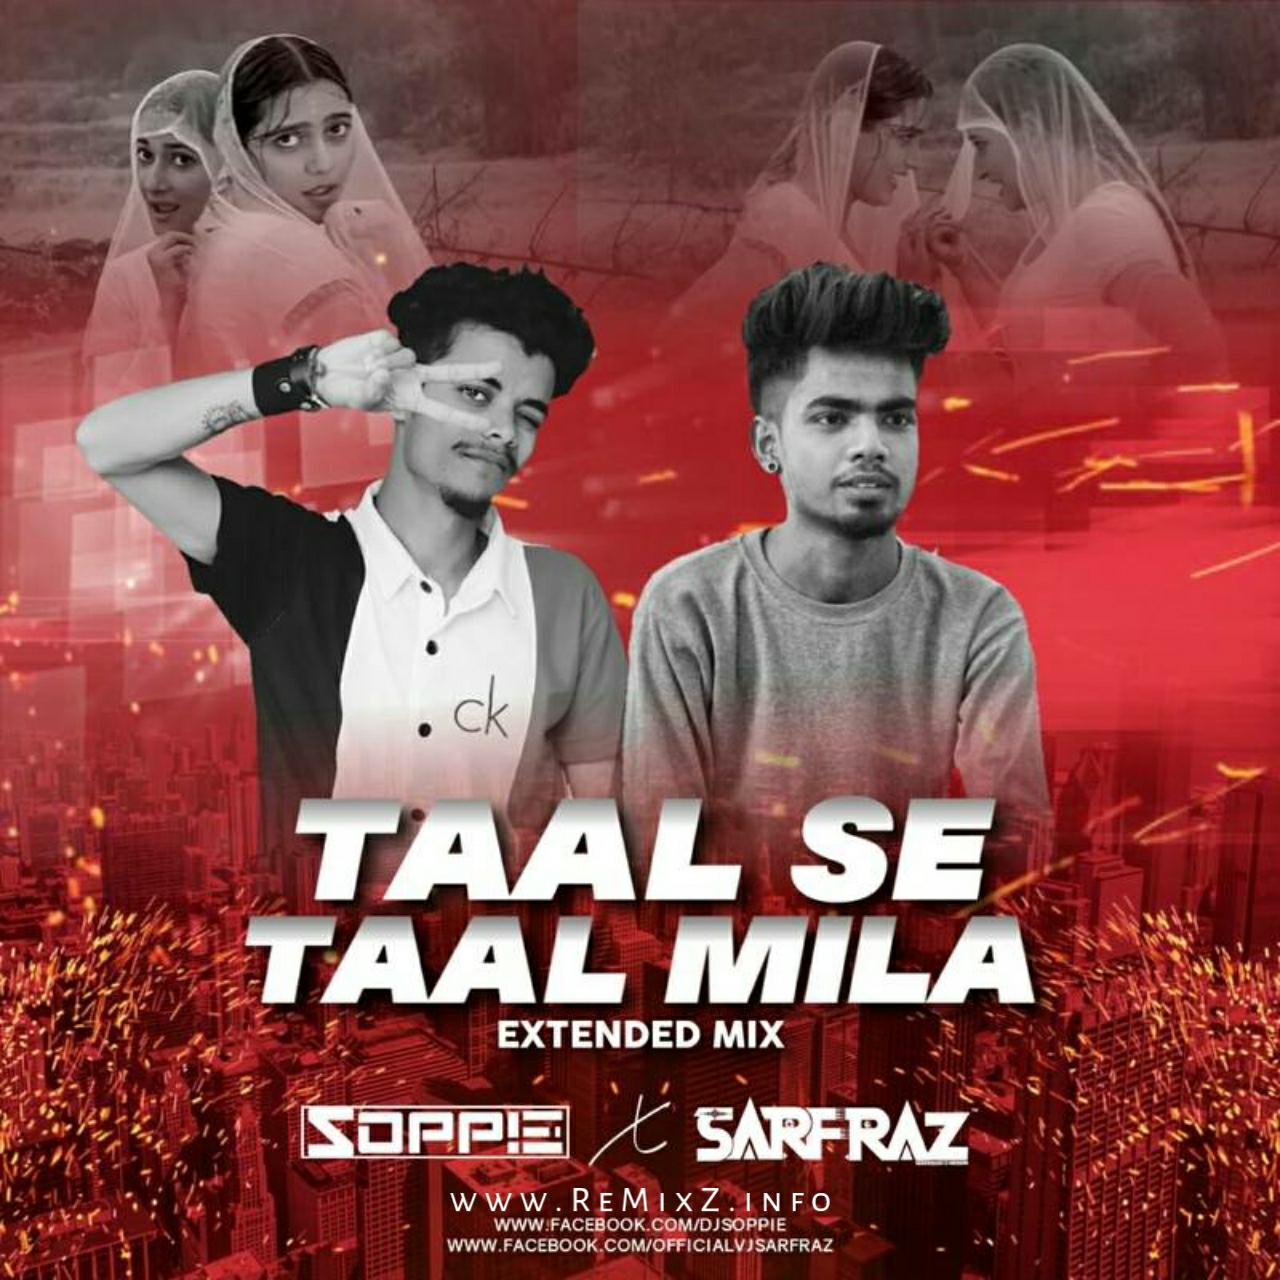 Taal Se Taal Mila (Extended Mix) SOPPIE x SARFRAZ